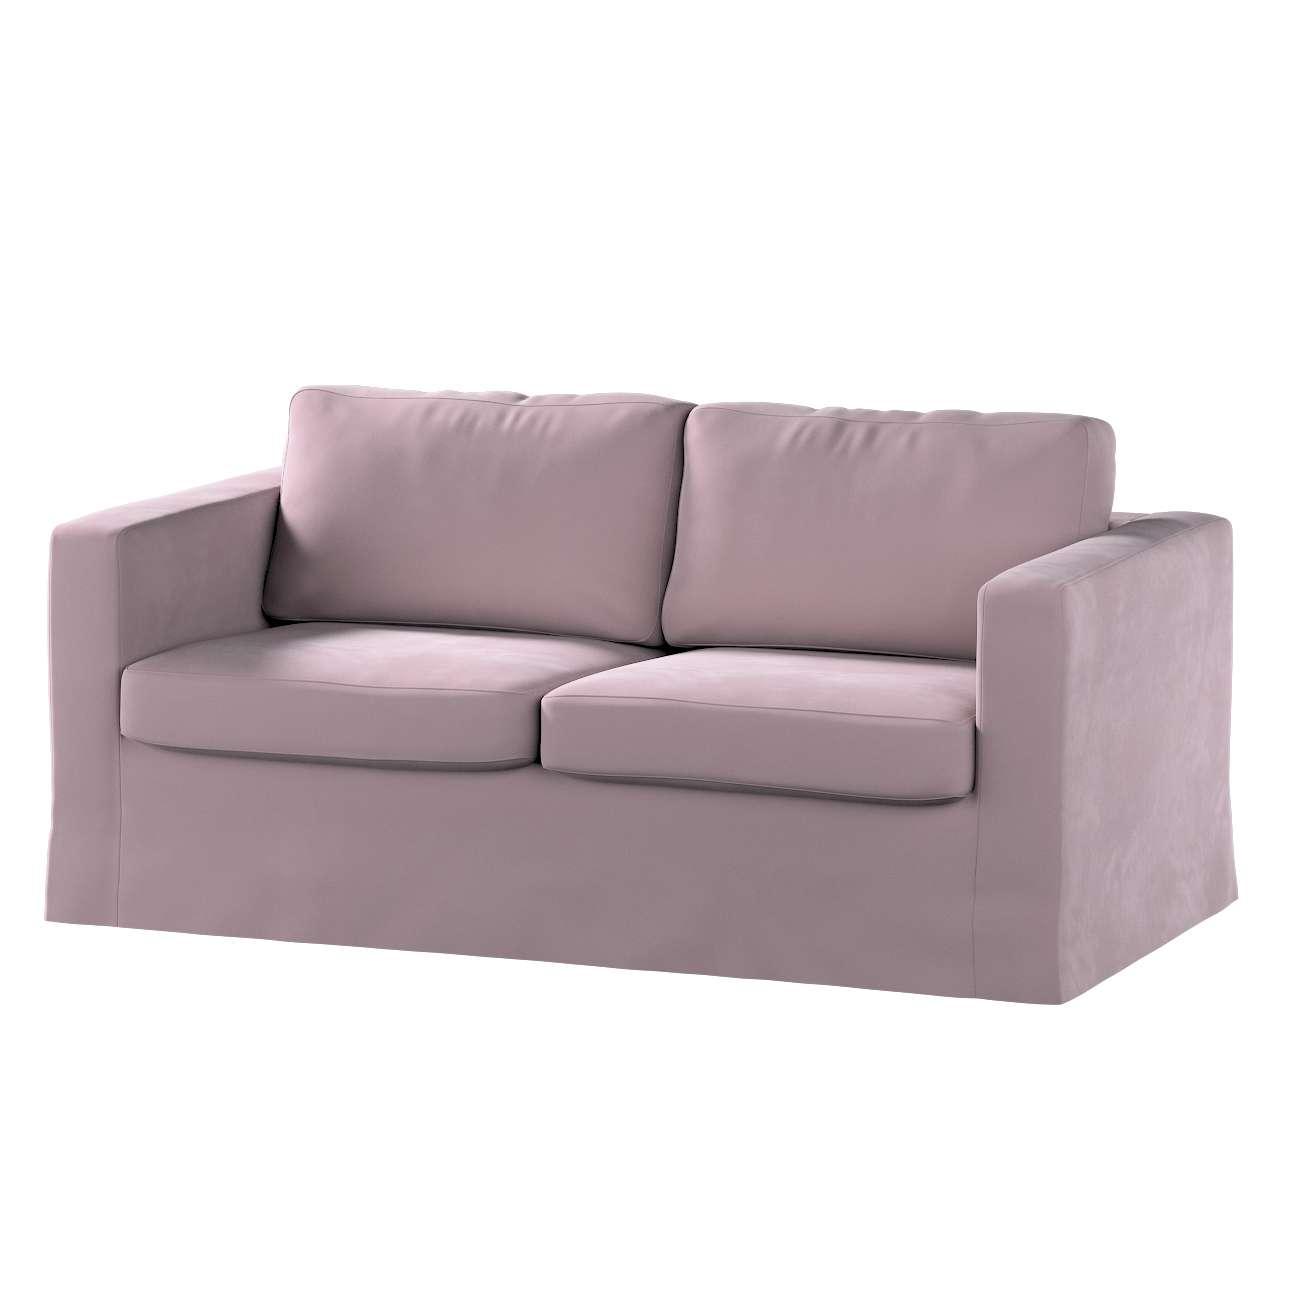 Floor length Karlstad 2-seater sofa cover in collection Velvet, fabric: 704-14